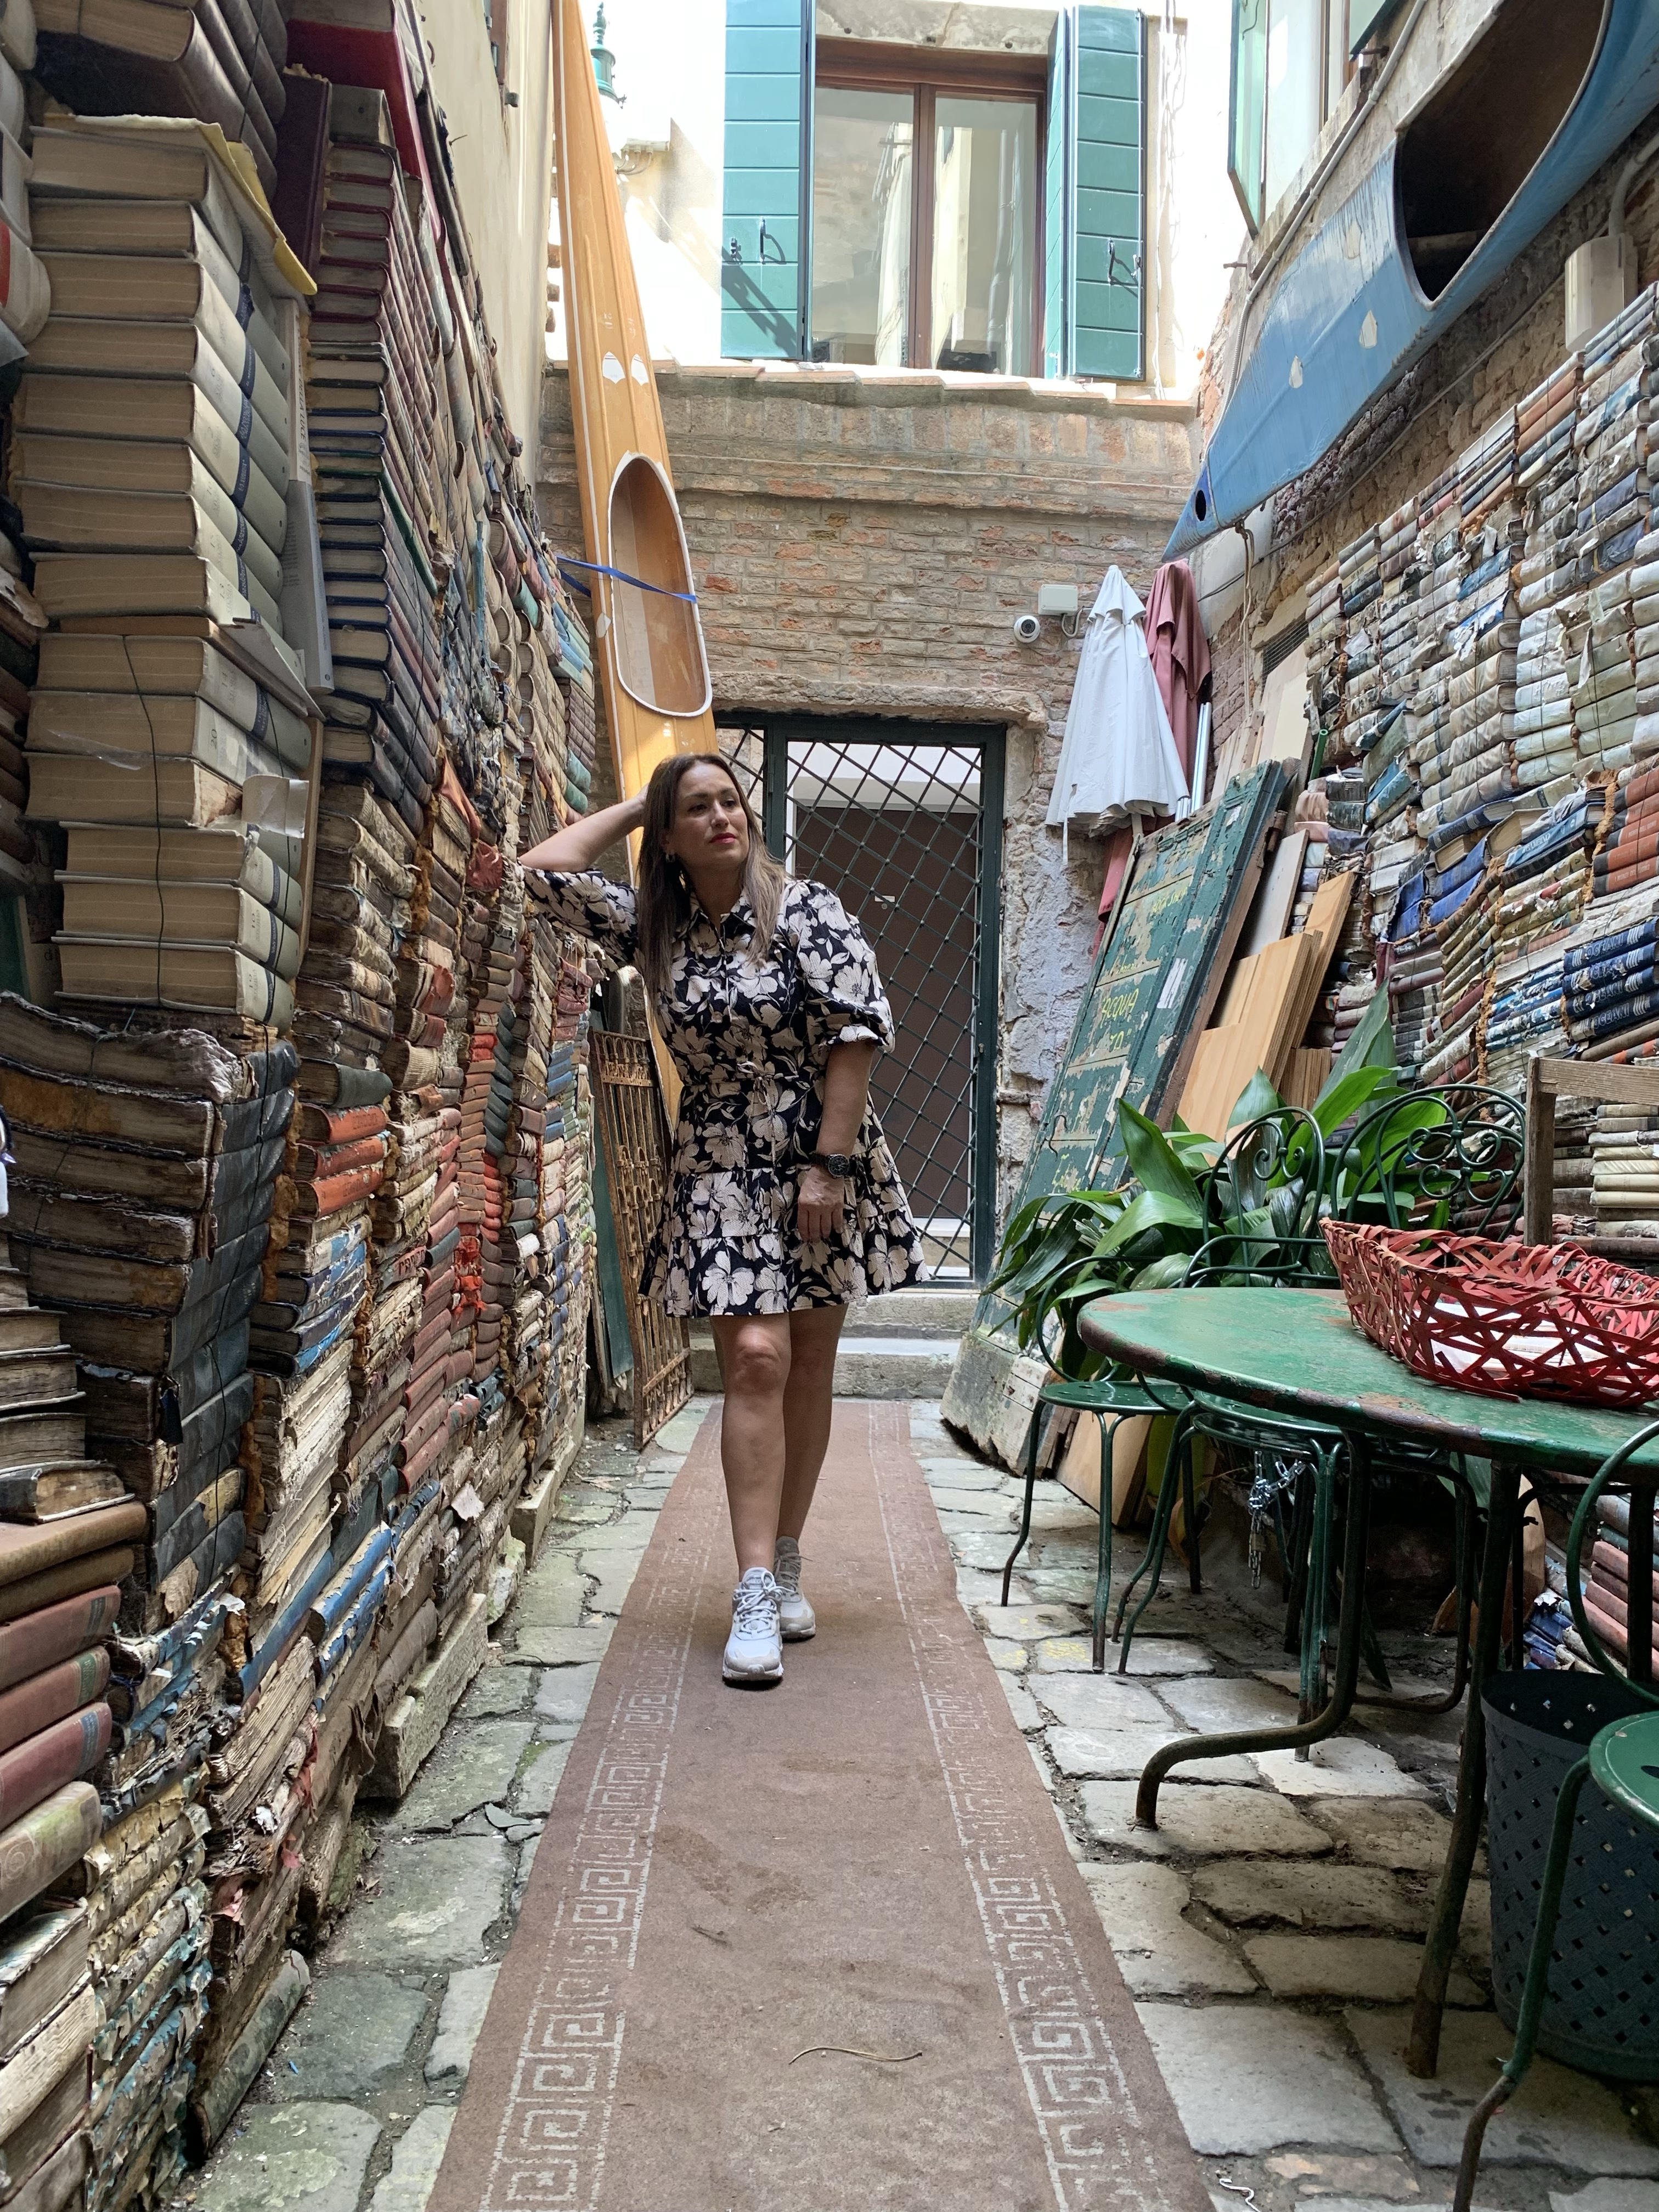 Libreria-acqua-alta-whynot-shopper-venecia-libros-segunda-mano-lifestyle-luigi-frizzo-blogger-fashion-influencer